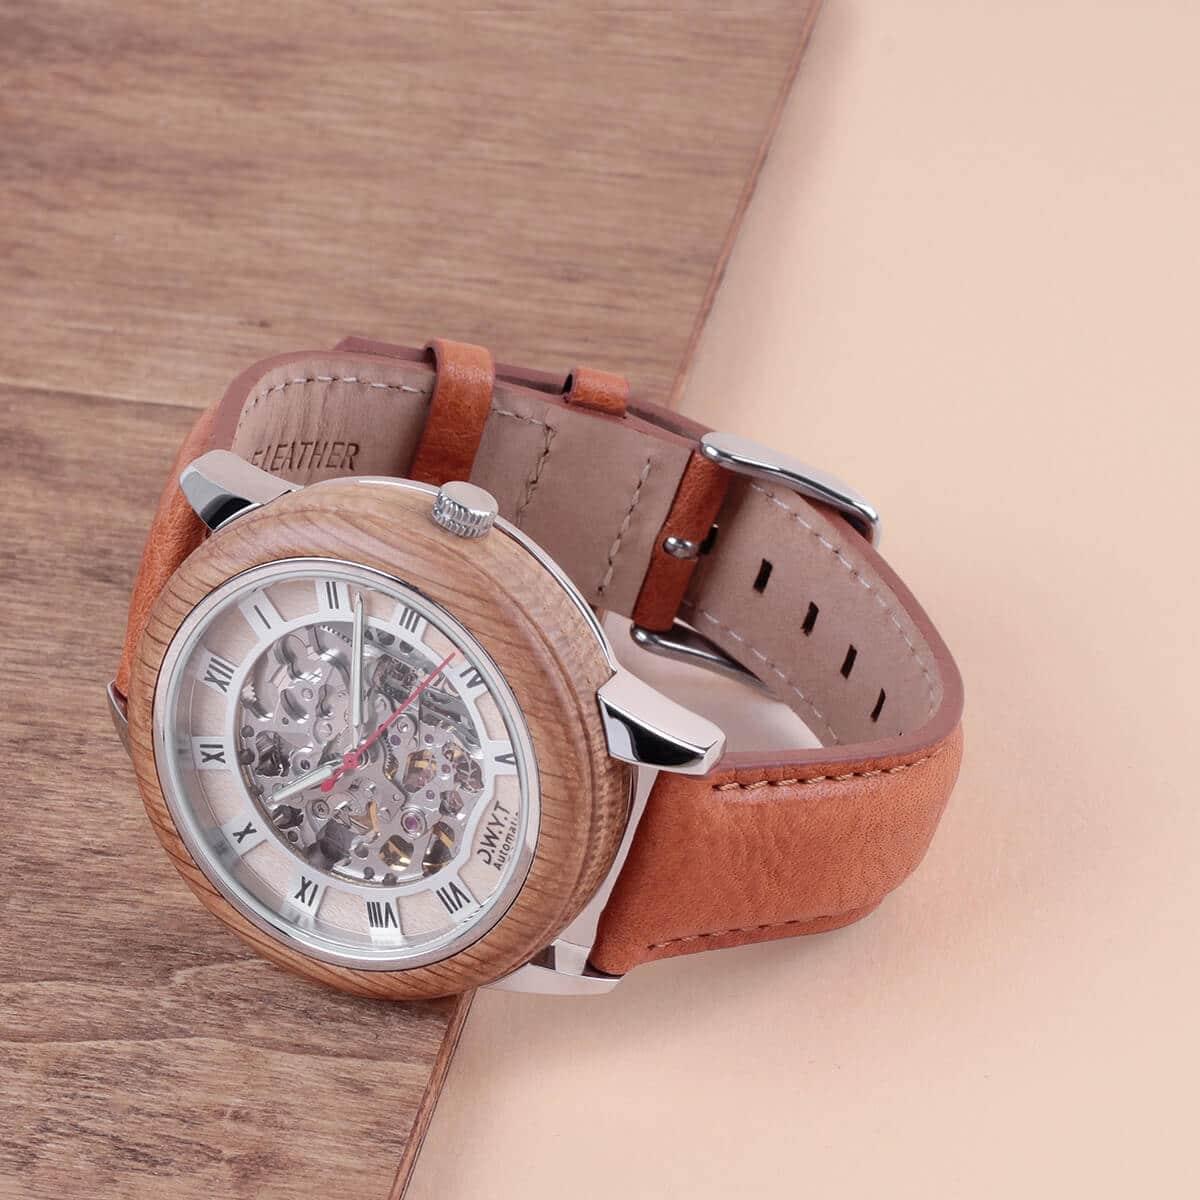 Montre en bois Imperial bracelet en cuir lisse